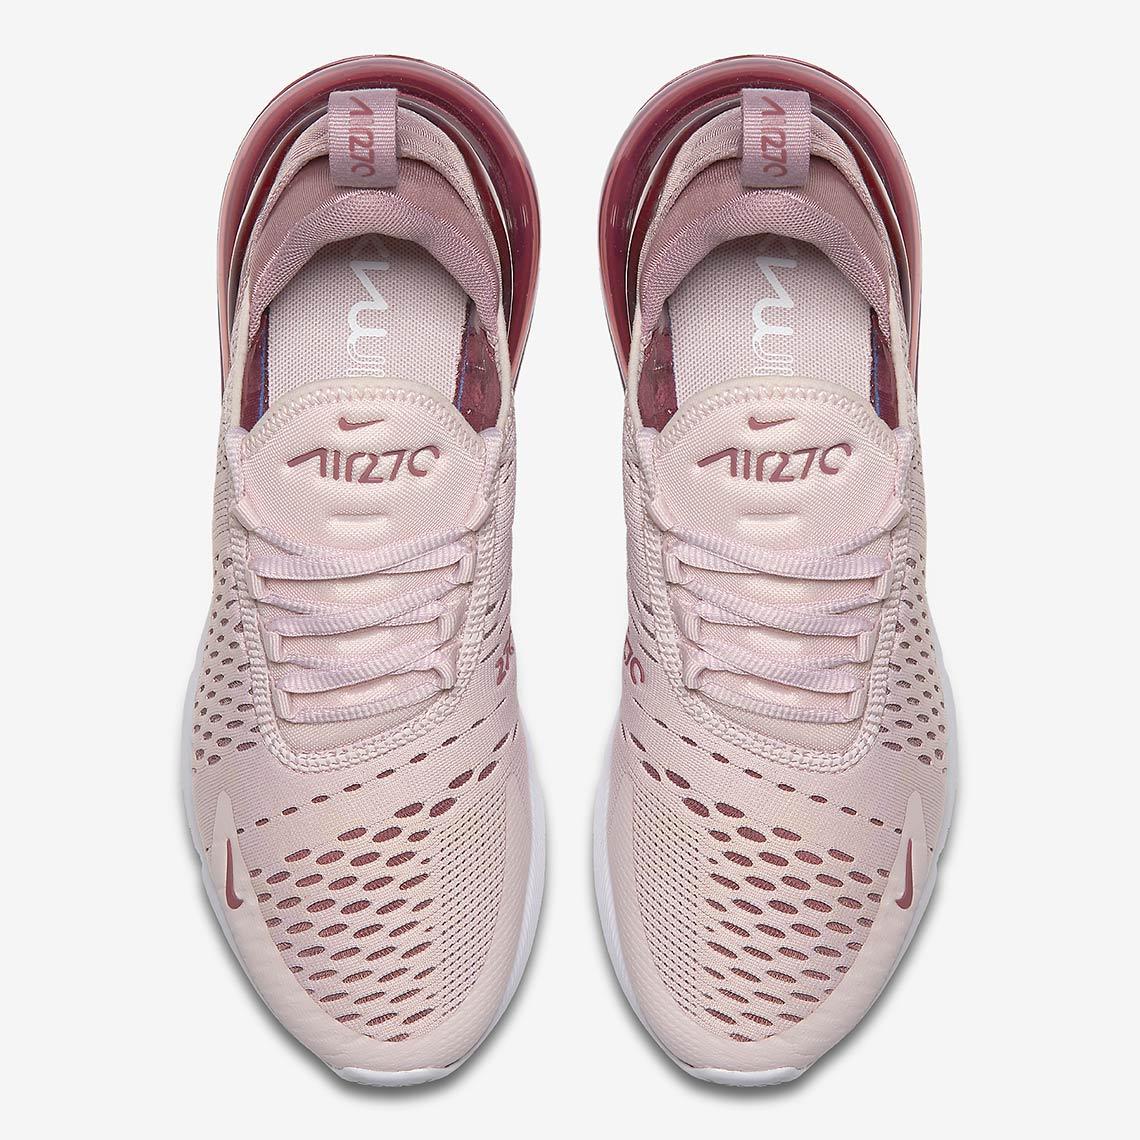 6055808798df Nike Air Max 270